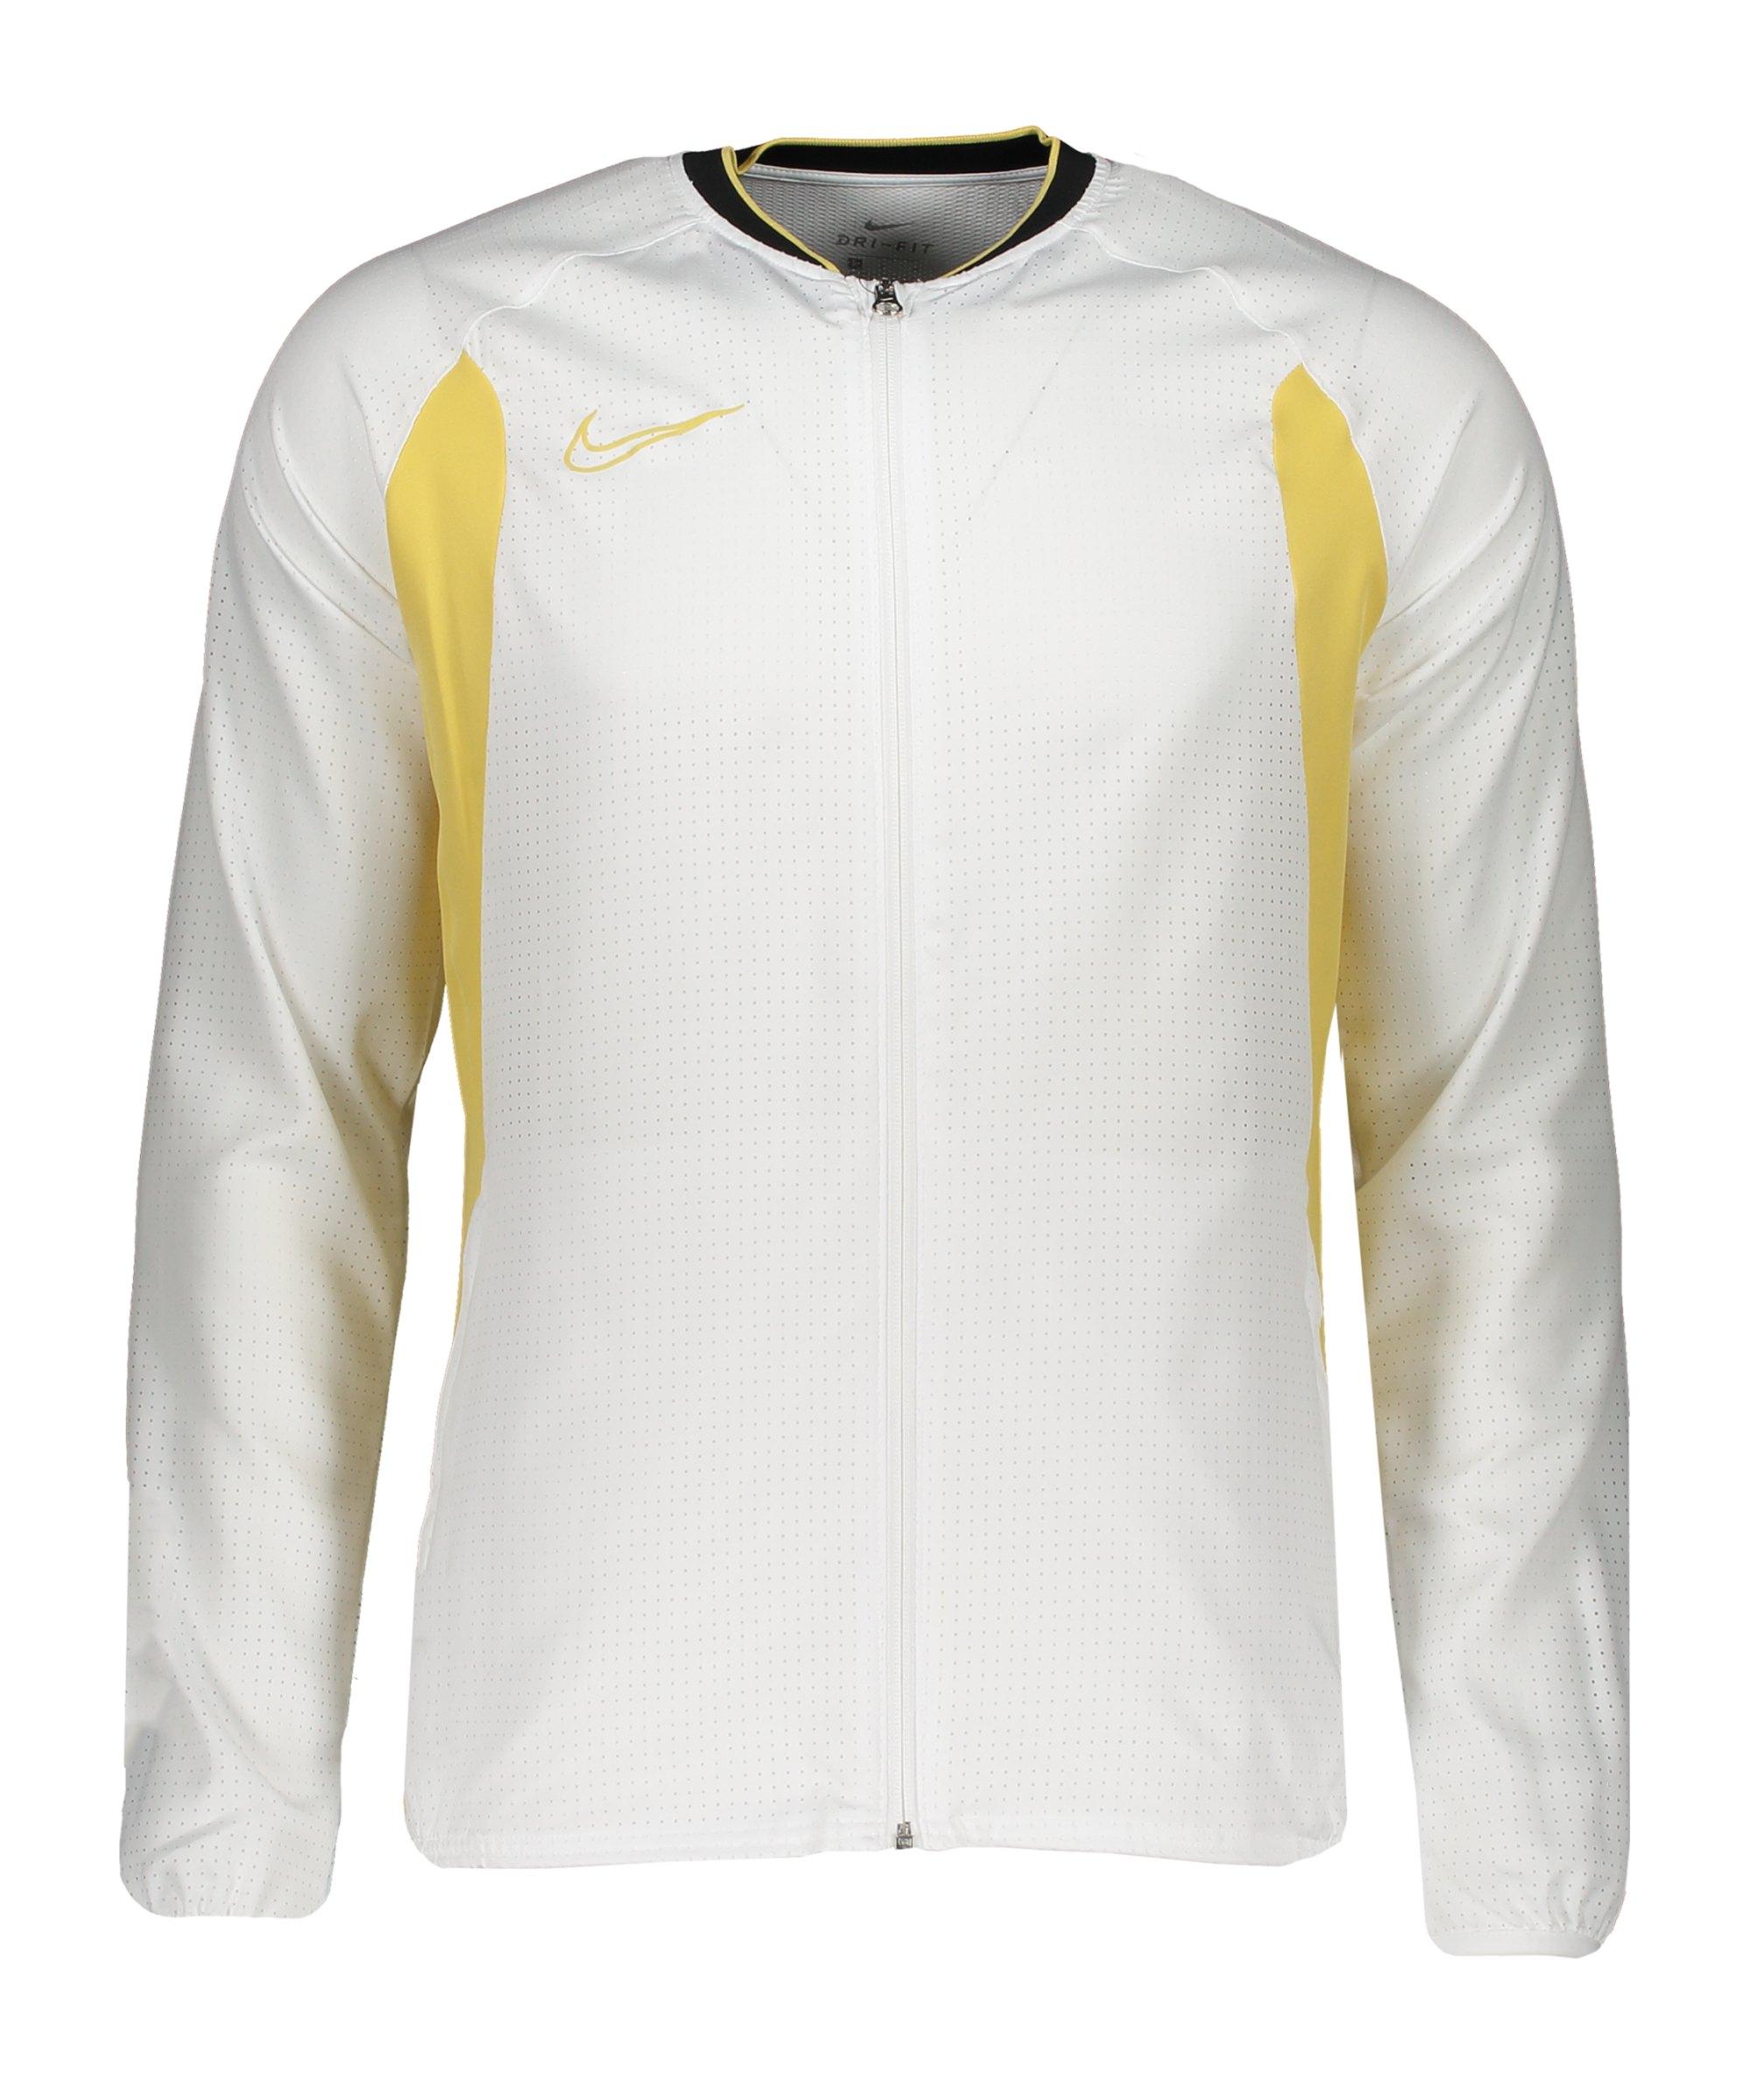 Nike Academy Trainingsjacke Summer Artist F100 - weiss